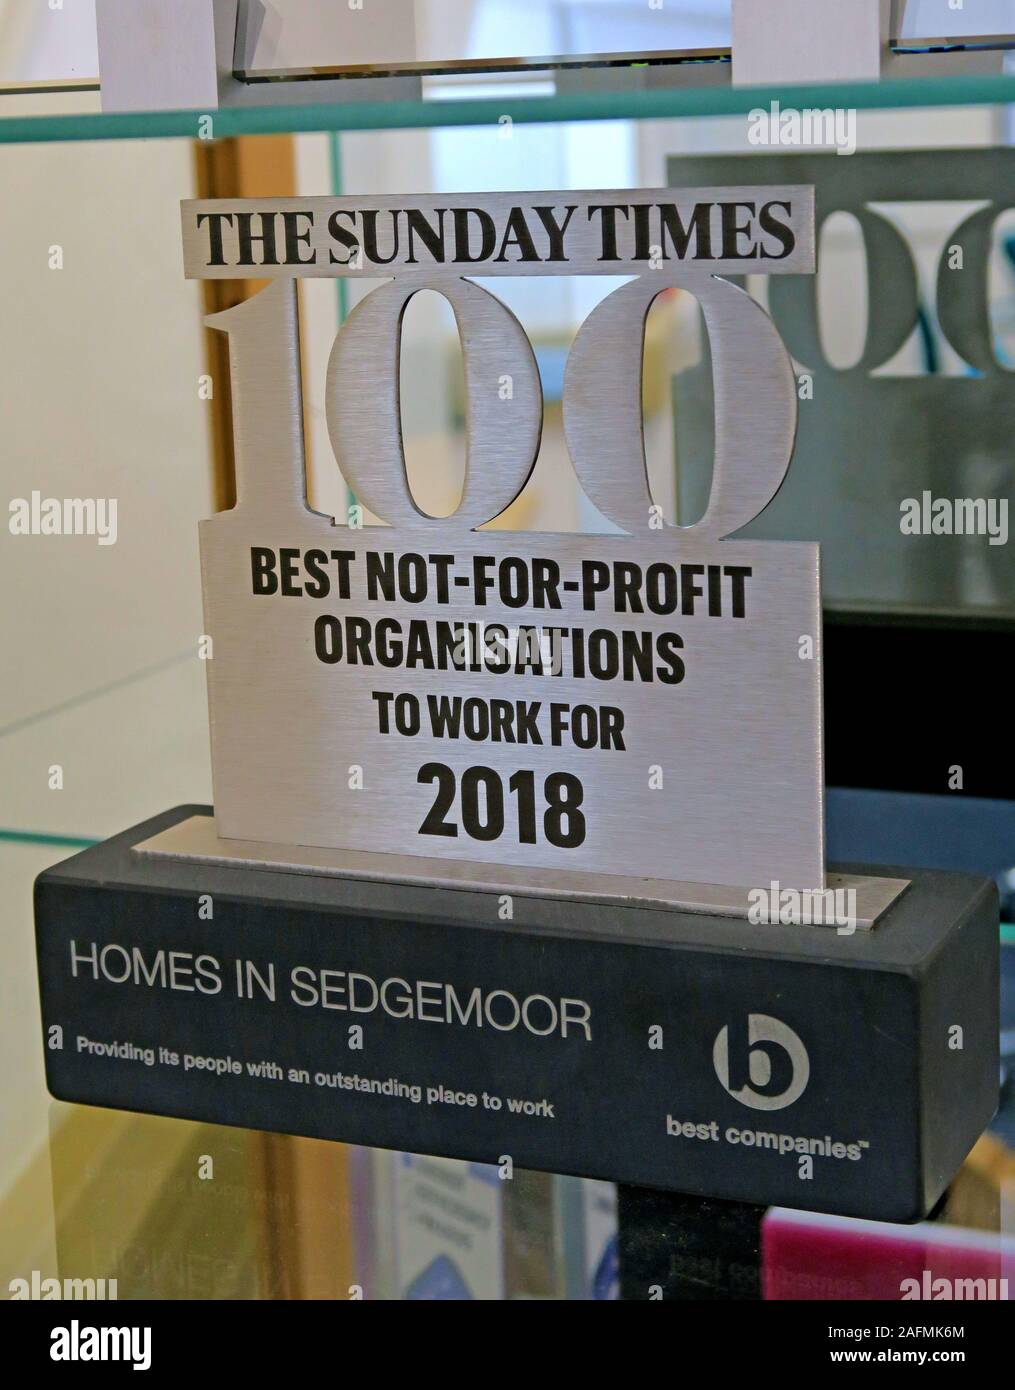 Sunday Times 100 Best Not For Profit Organisations,awards cabinet, Homes In Sedgemoor,Bridgwater,award winning social housing landlord Stock Photo